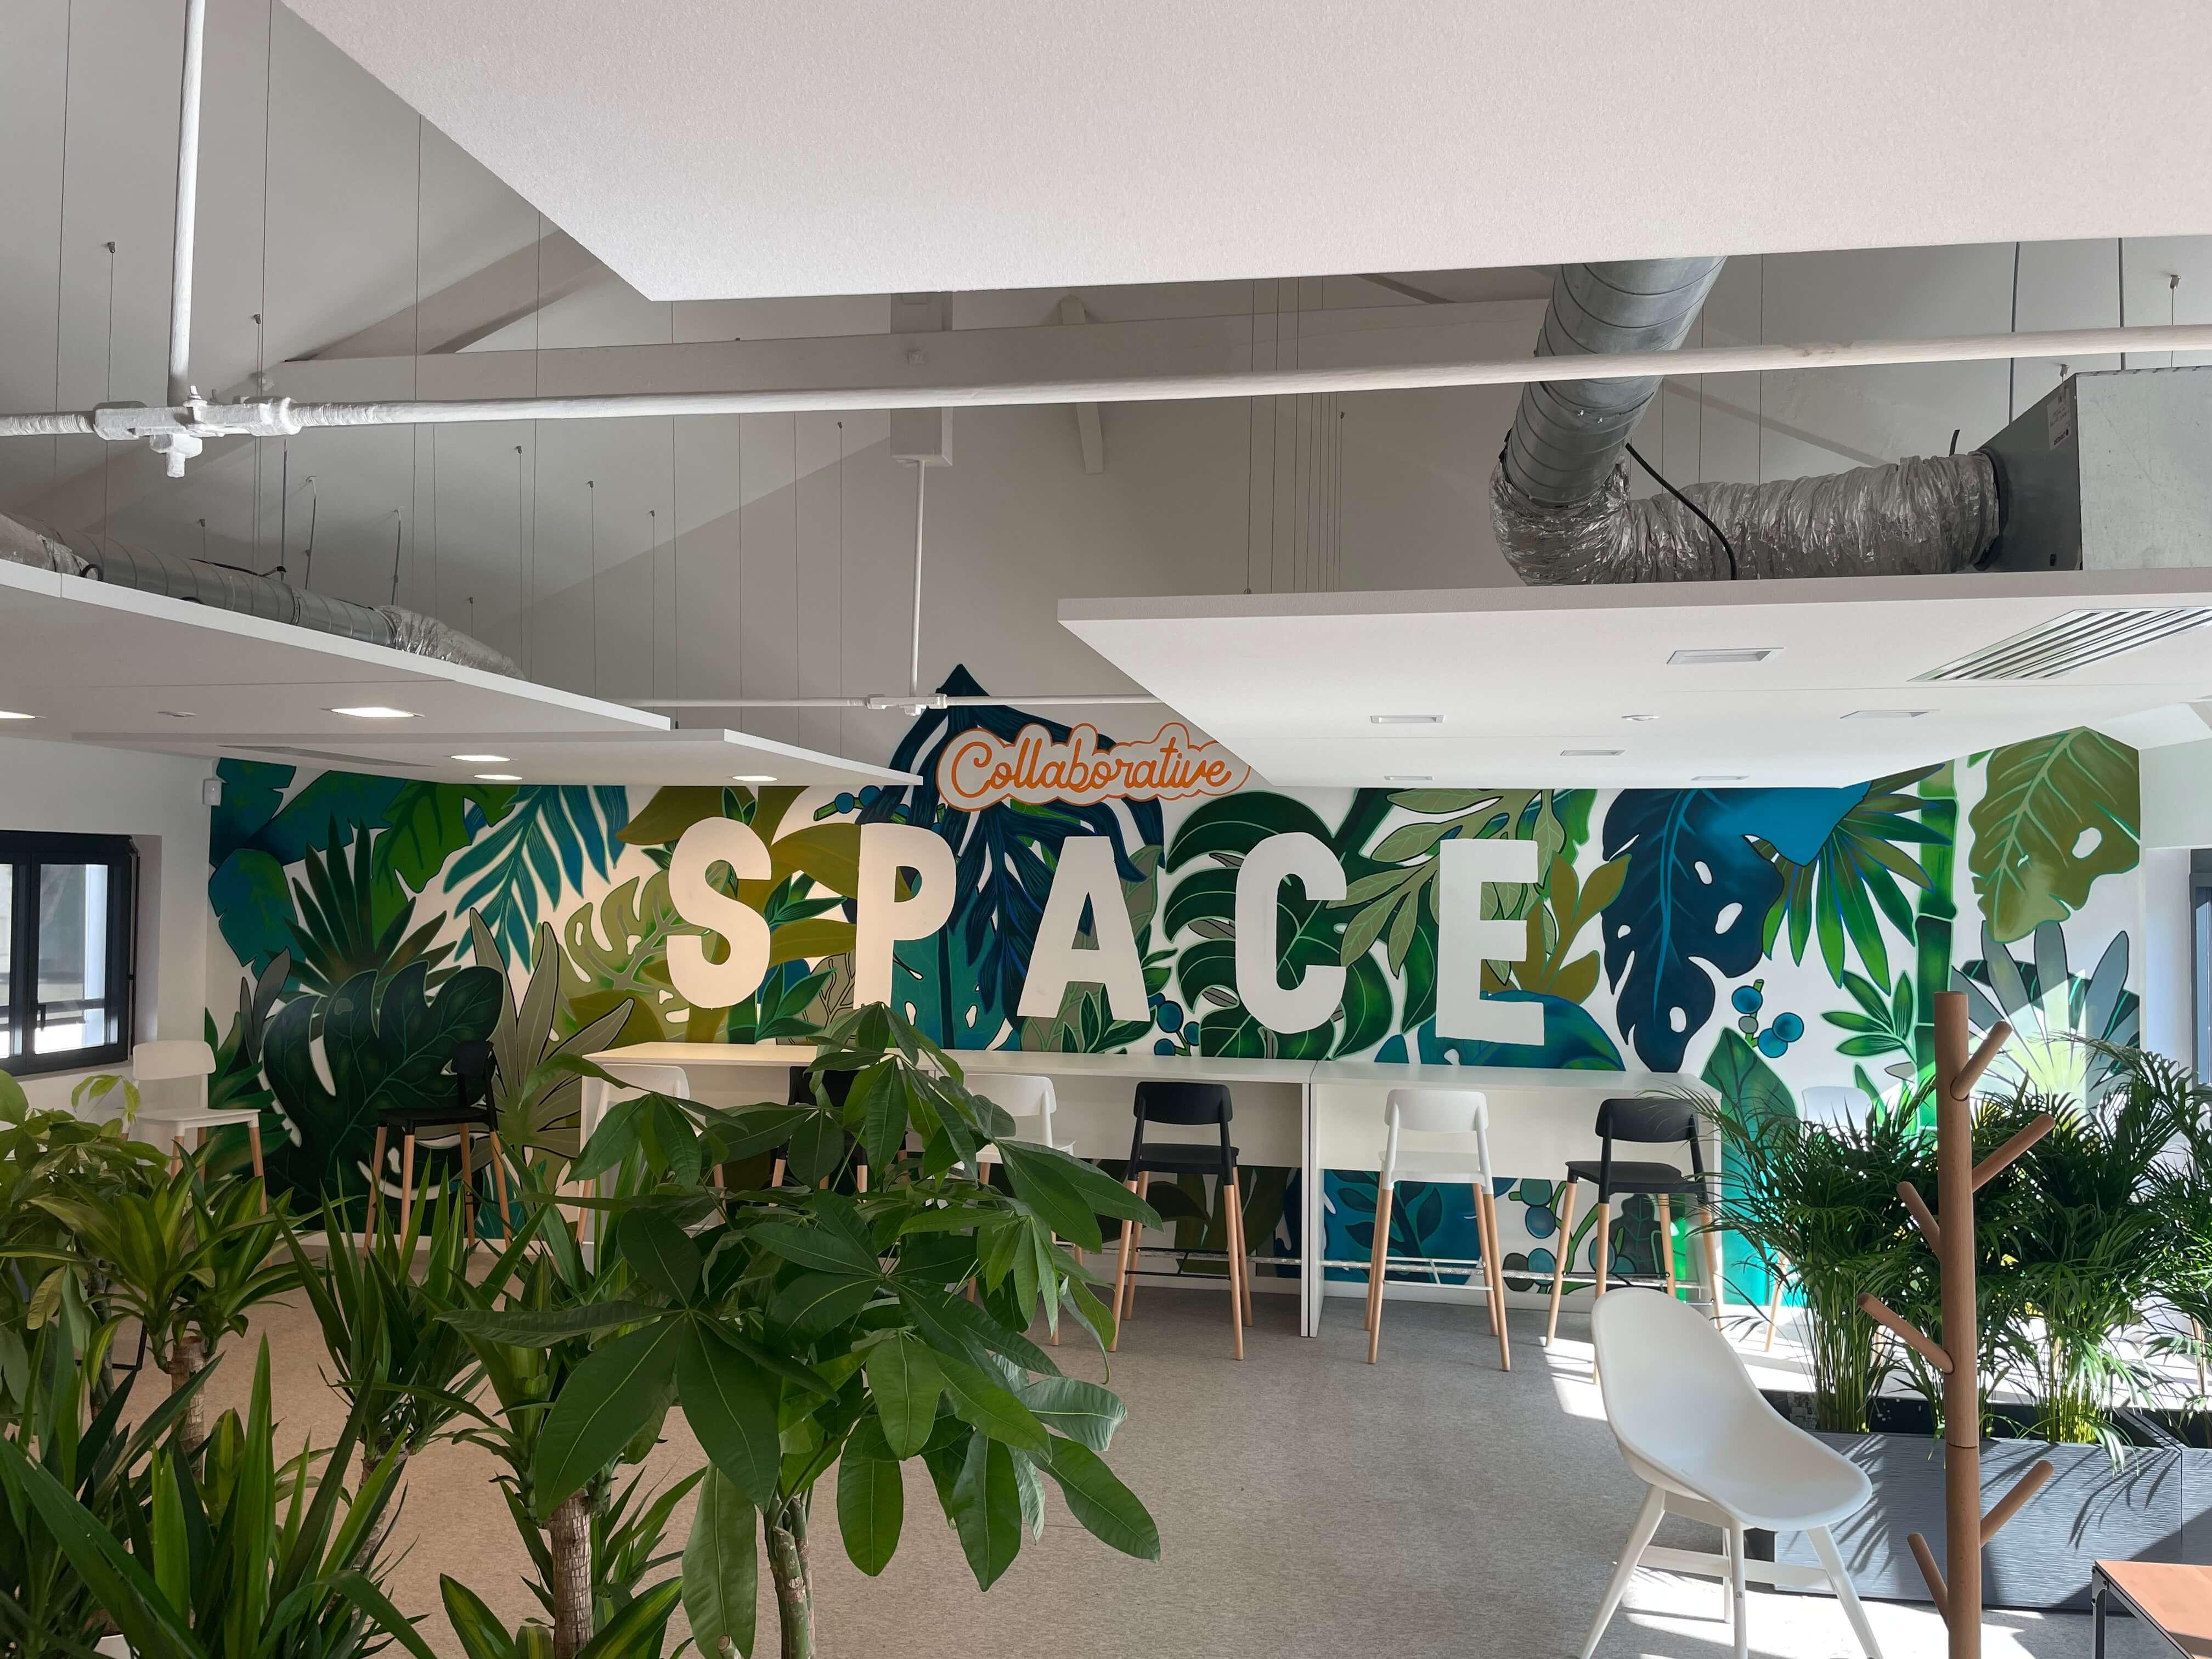 street designers blog posts thumbnails team building evenements